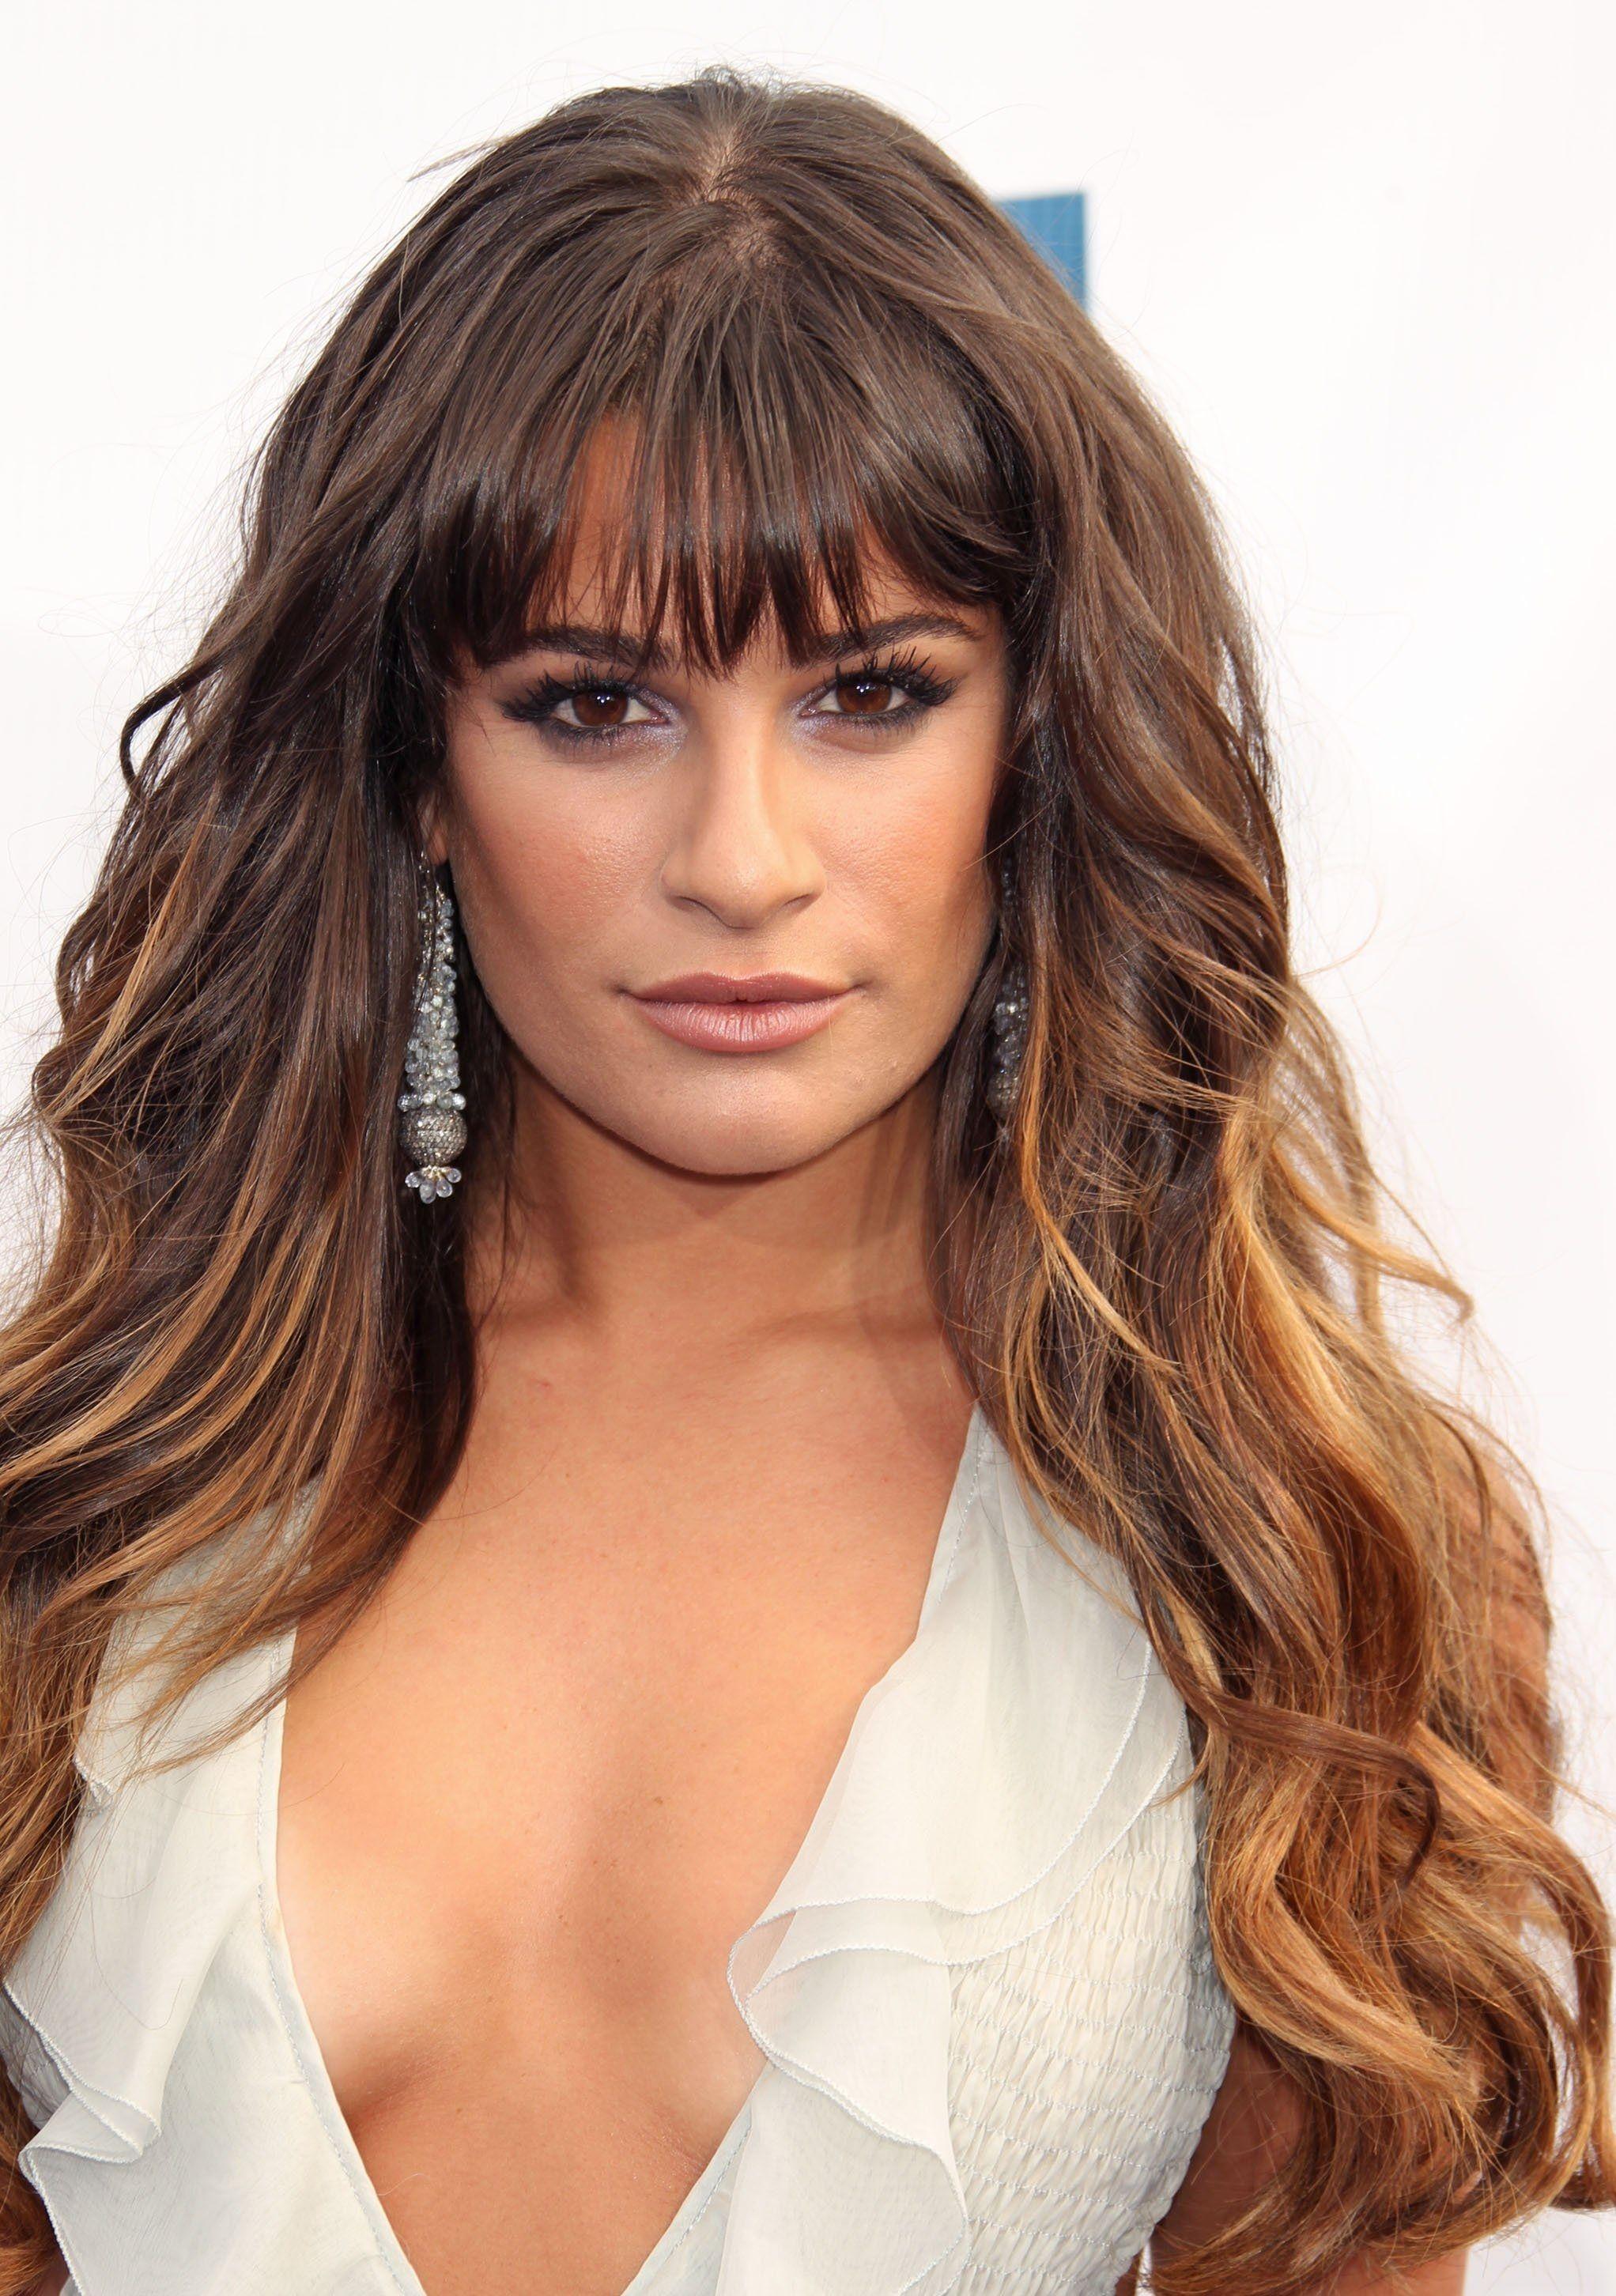 Lea Michele Lea Michele Do Something Awards August 19 2012